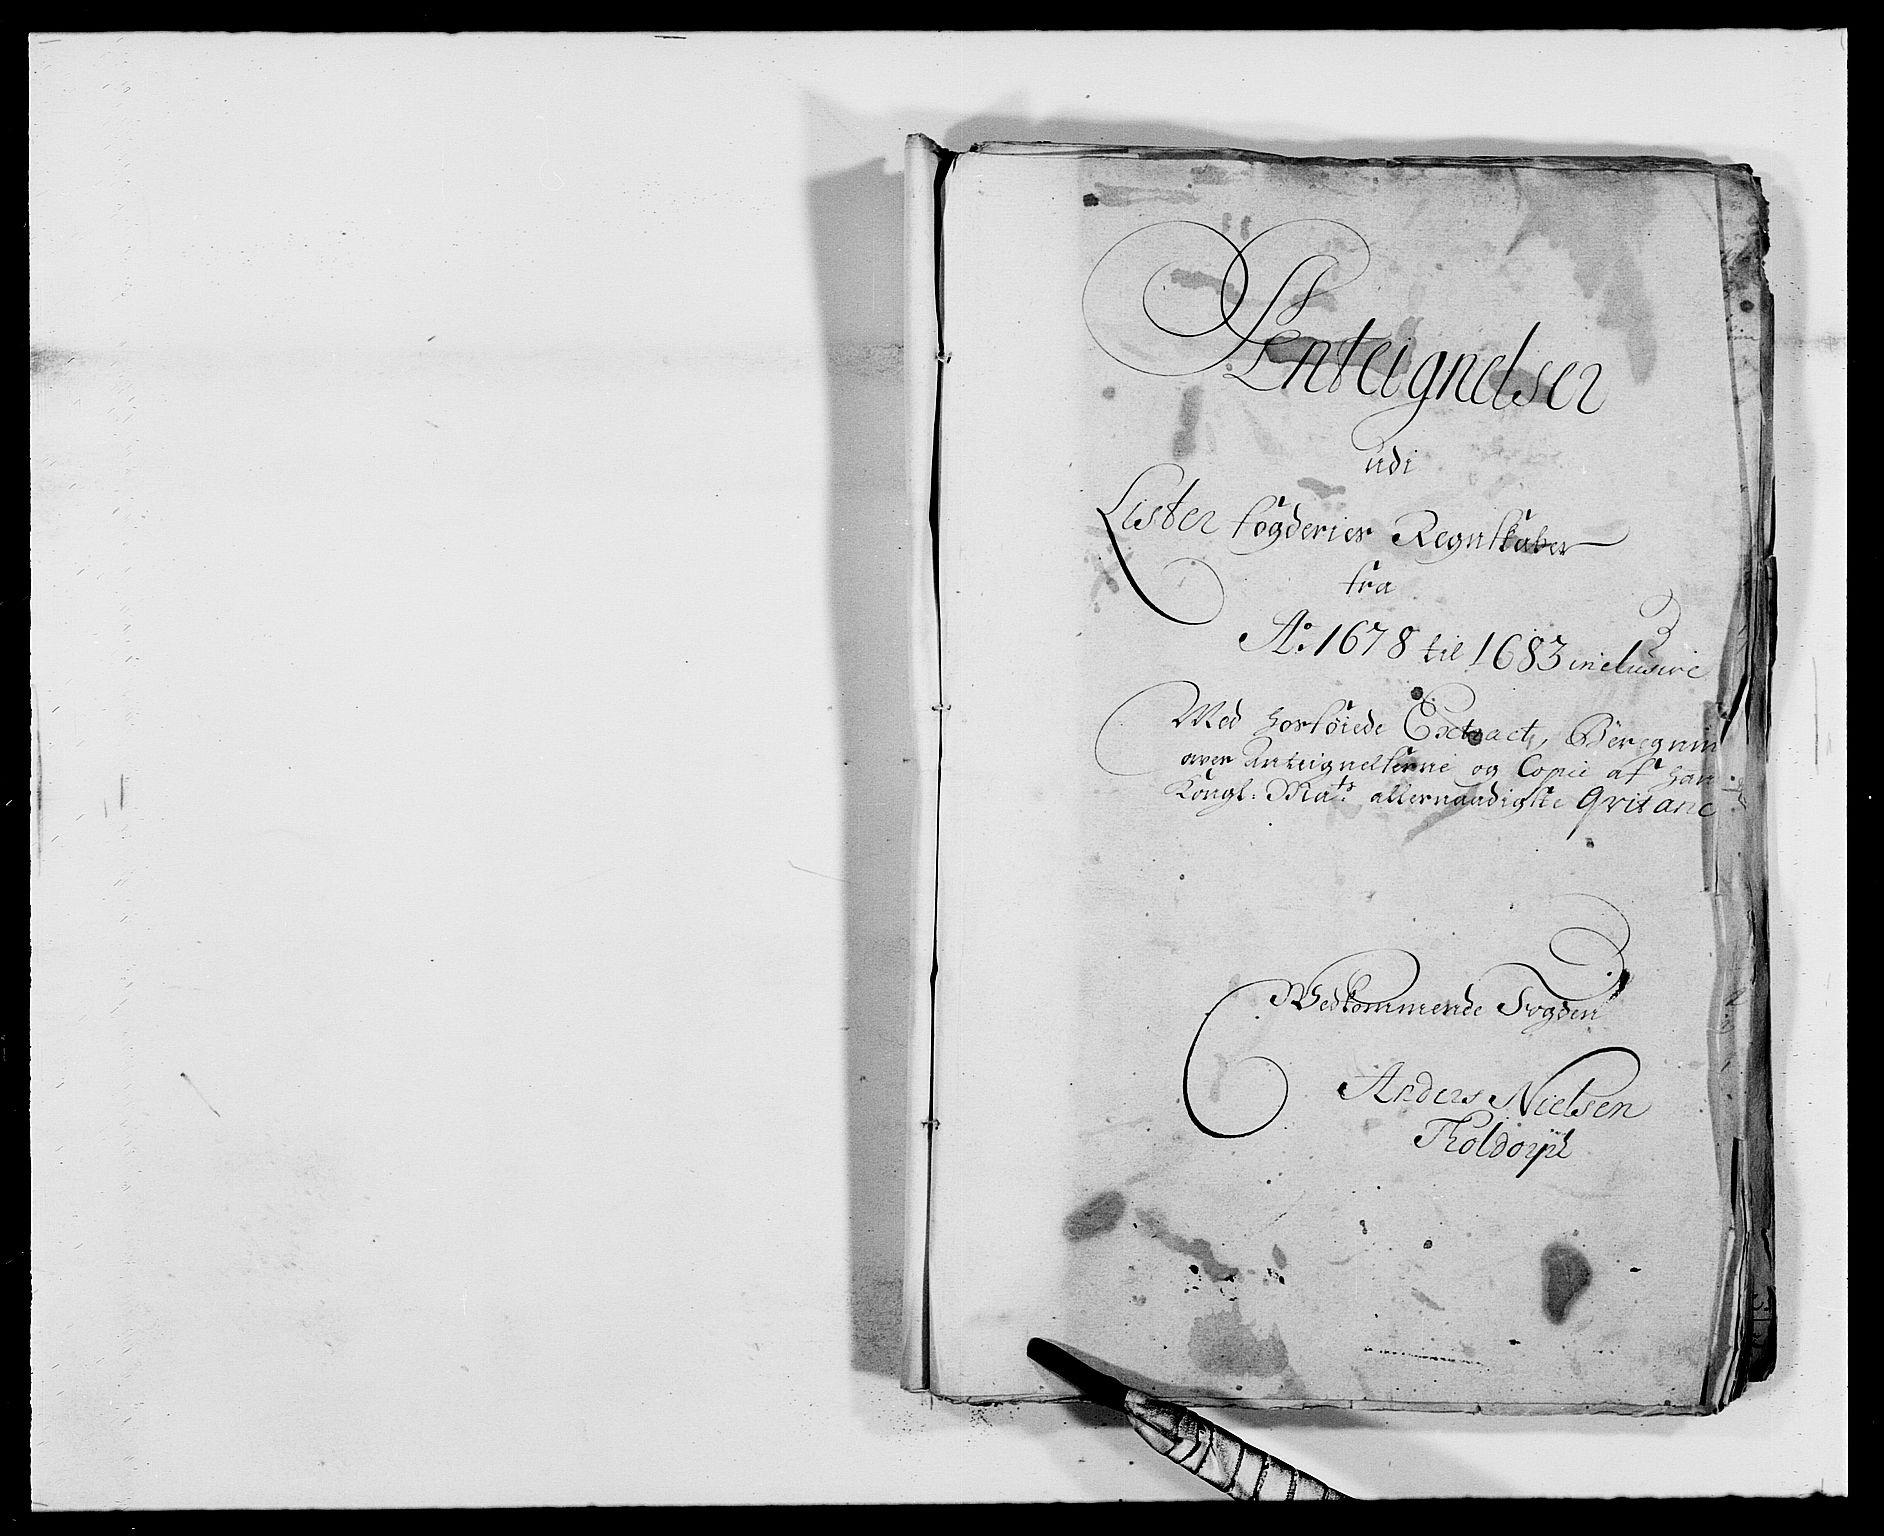 RA, Rentekammeret inntil 1814, Reviderte regnskaper, Fogderegnskap, R41/L2532: Fogderegnskap Lista, 1683, s. 191